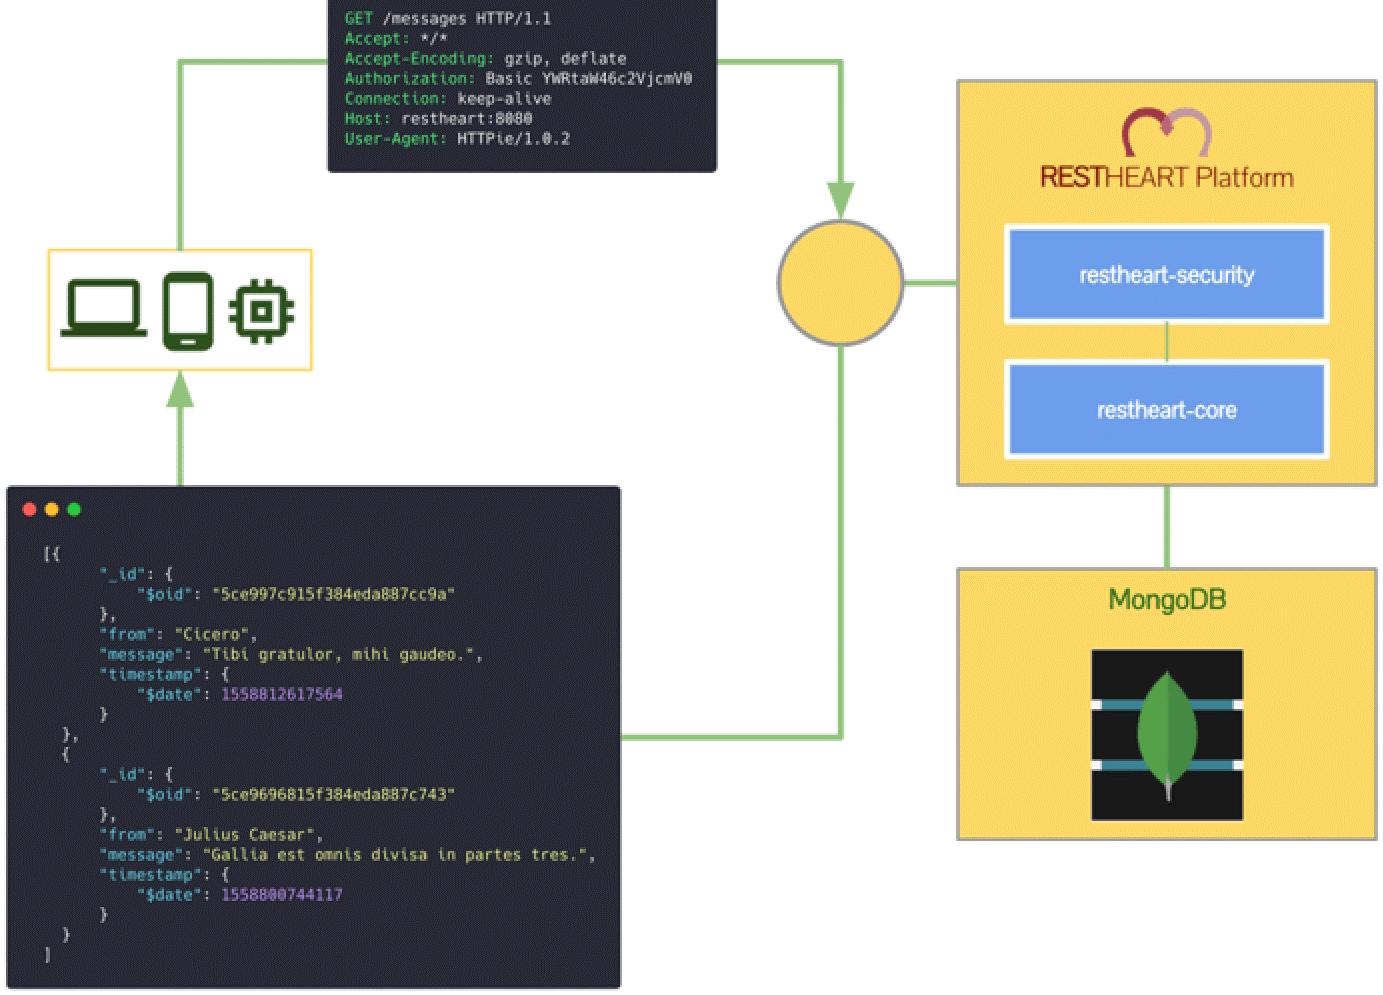 Figure 1 - RESTHeart's simple, MongoDB-driven architecture.